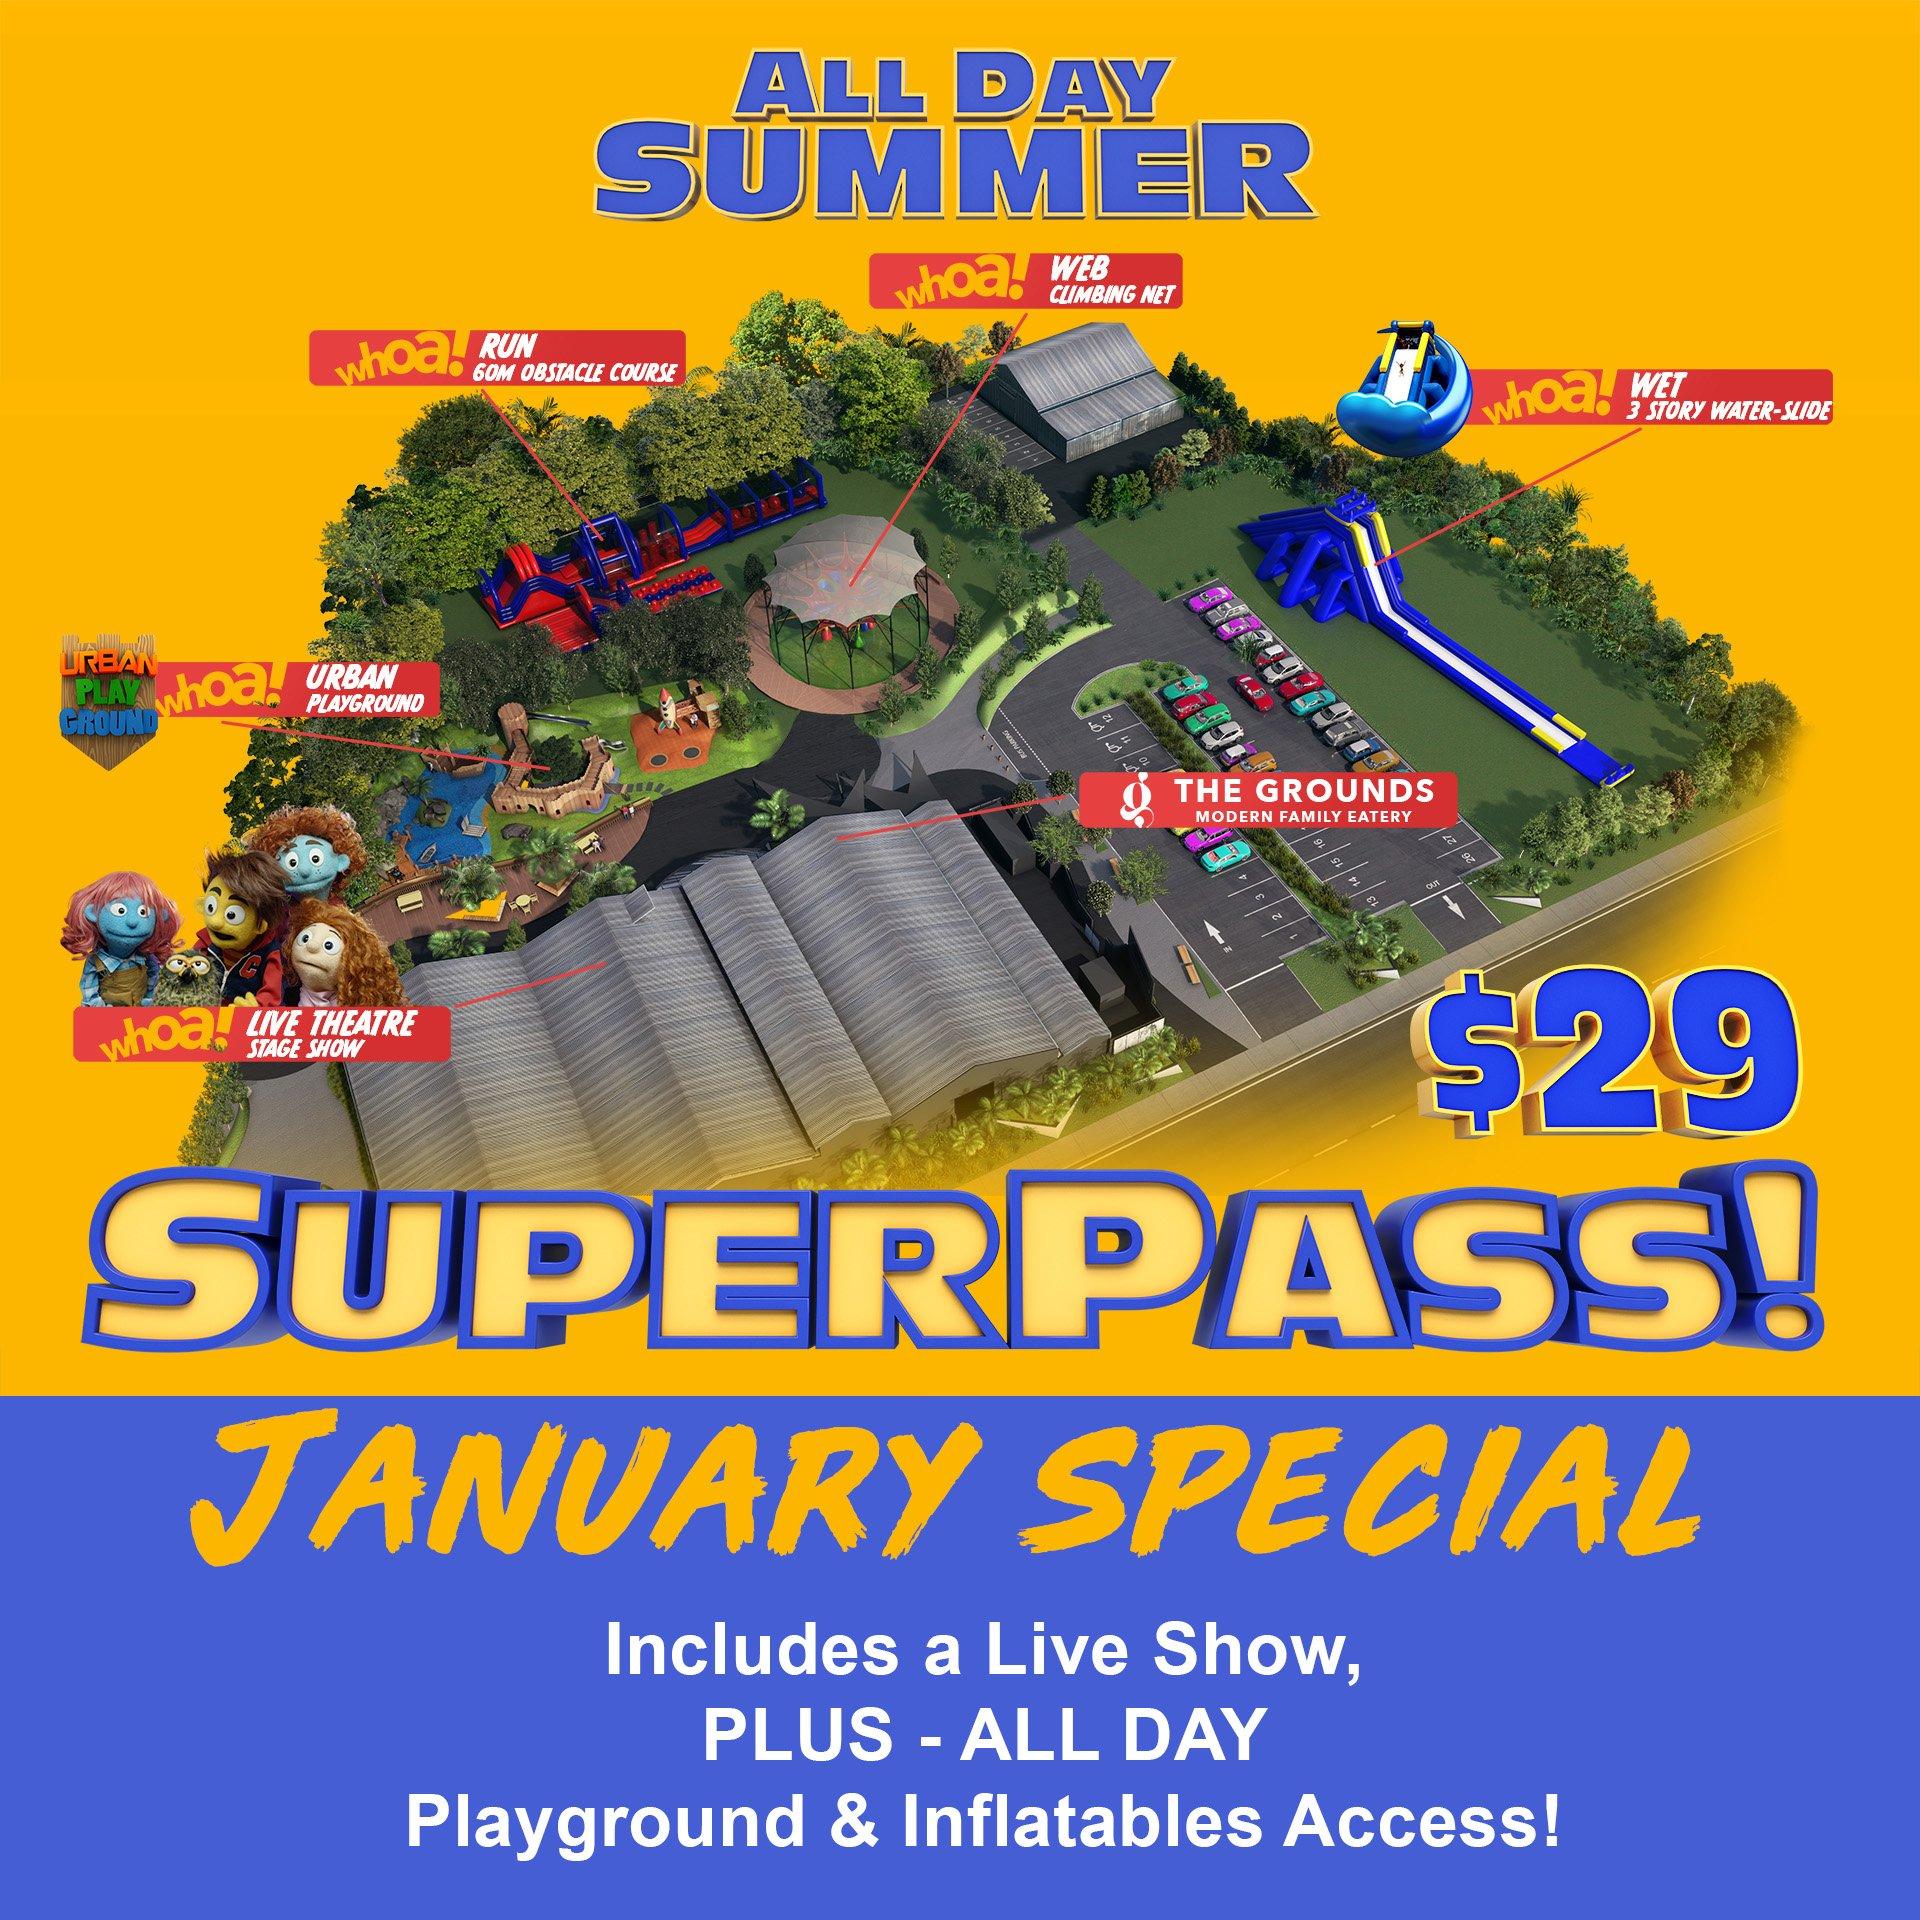 Whoa_Studios_NZ_Superpass_Web Jan Special